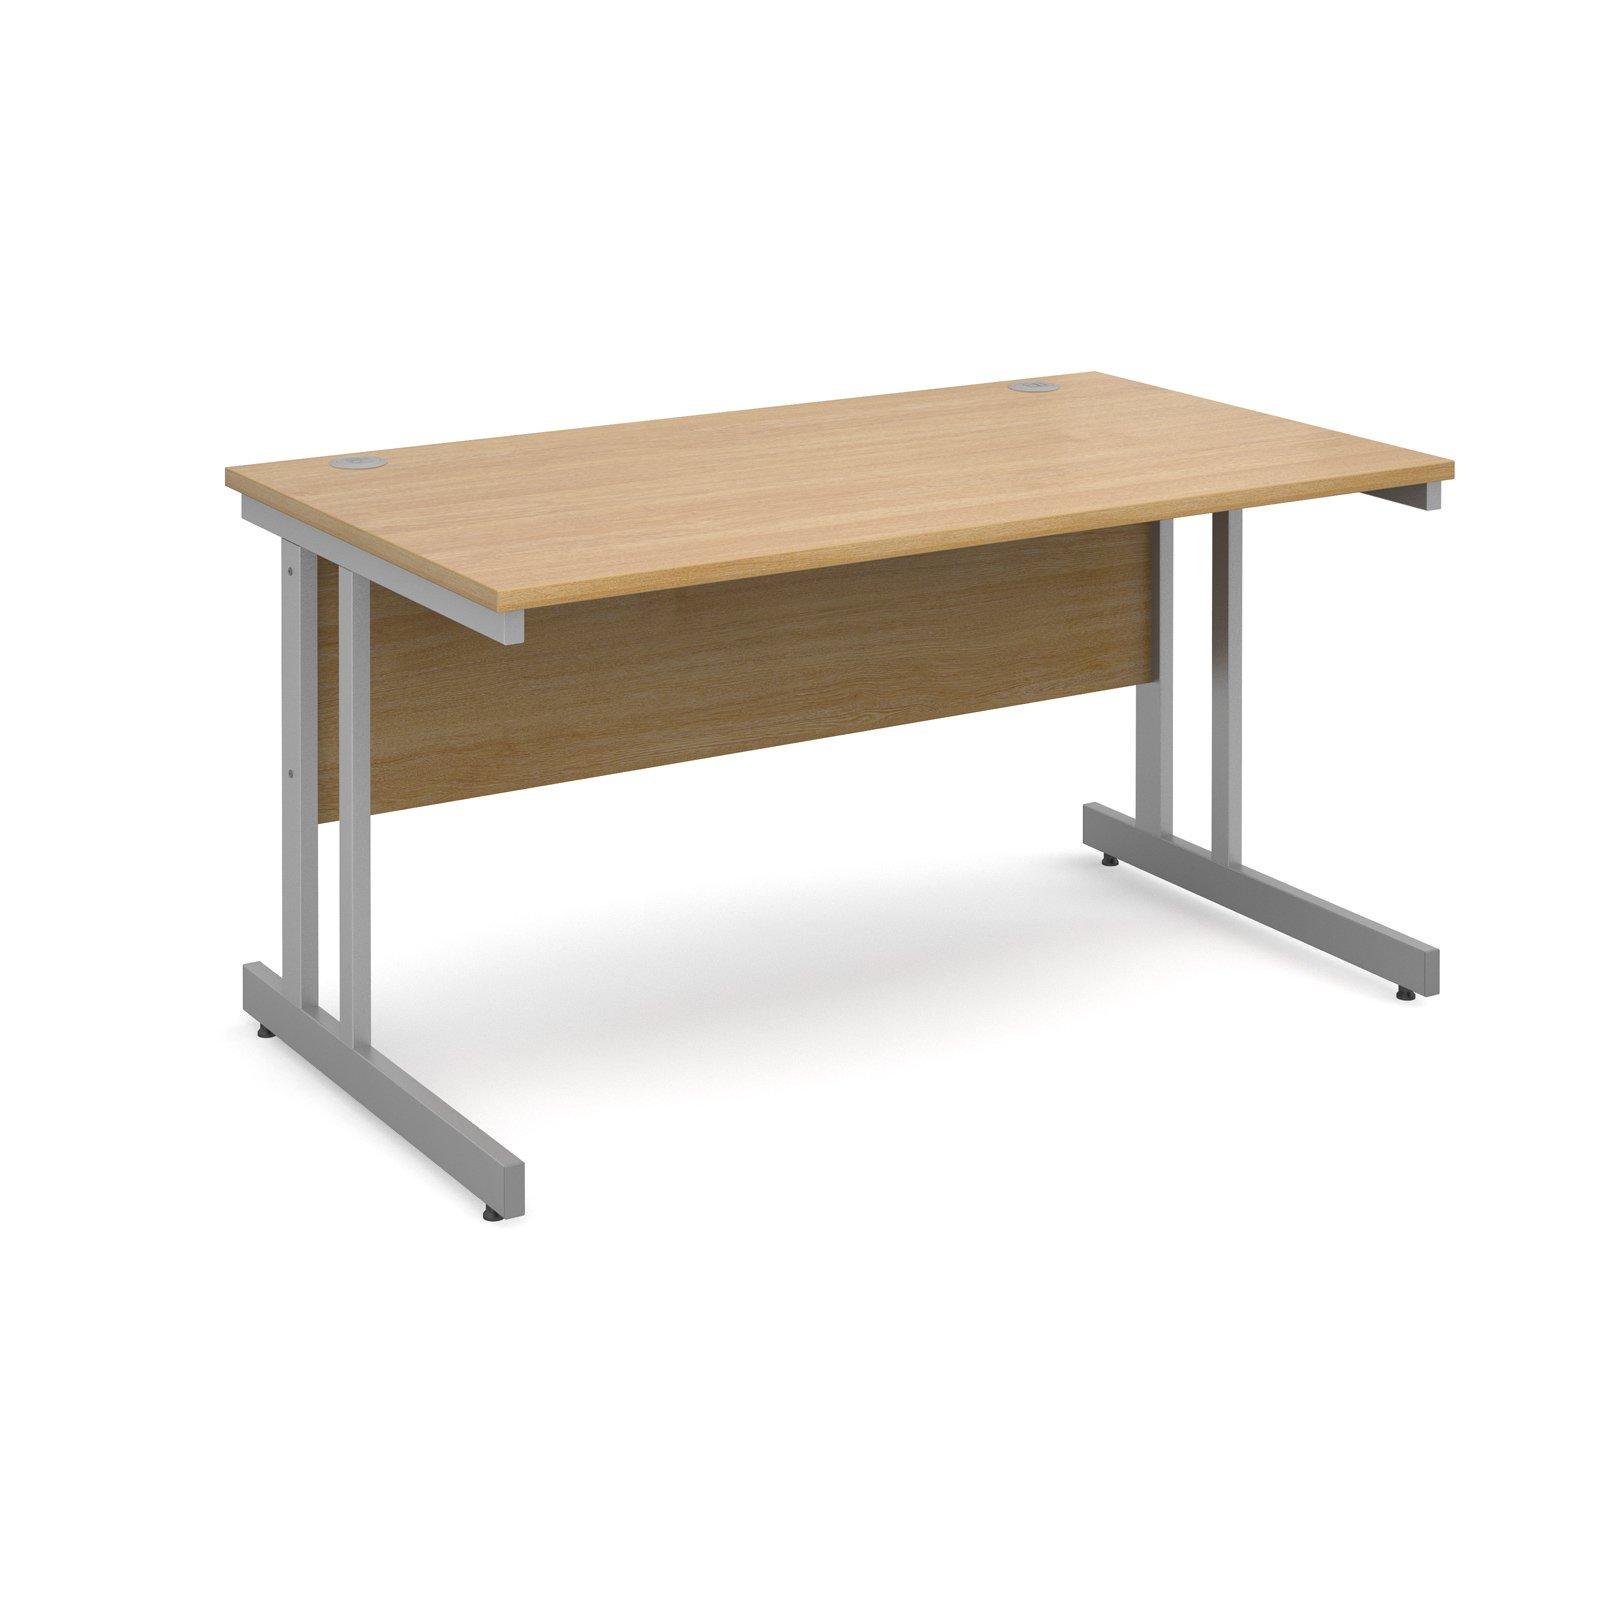 Momento straight desk 1400mm x 800mm - silver cantilever frame, oak top